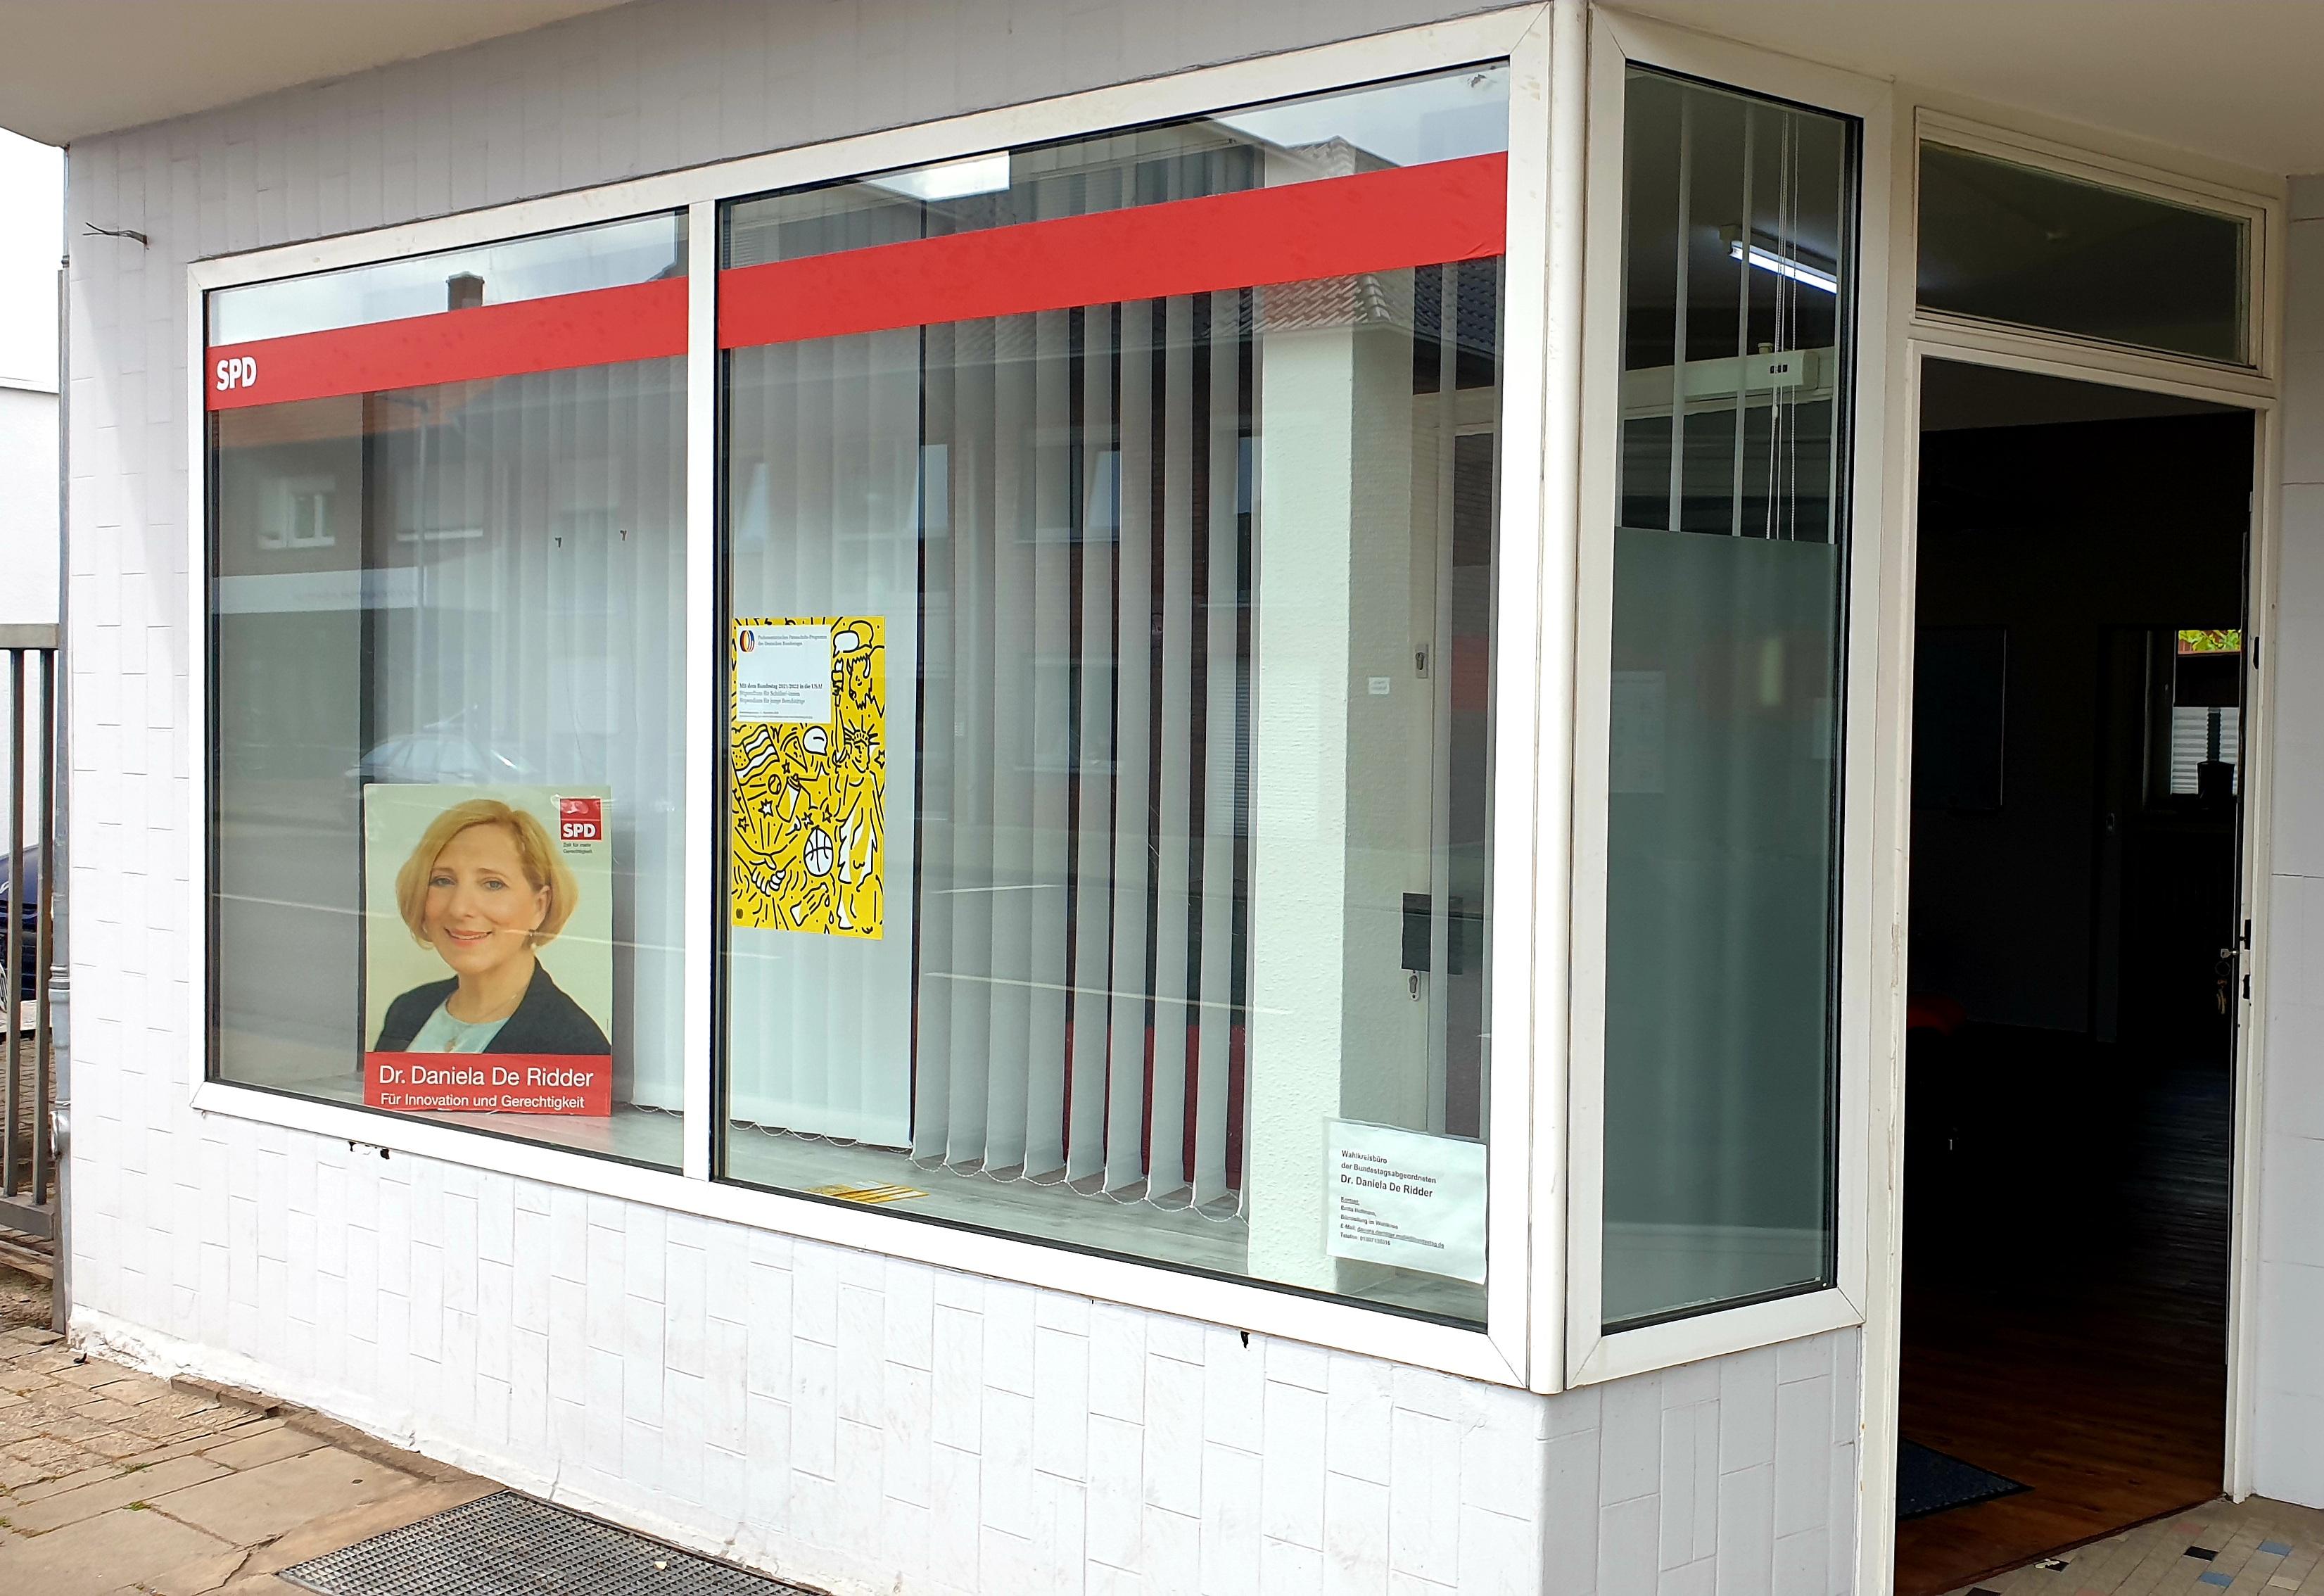 Wahlkreisbüro in Nordhorn